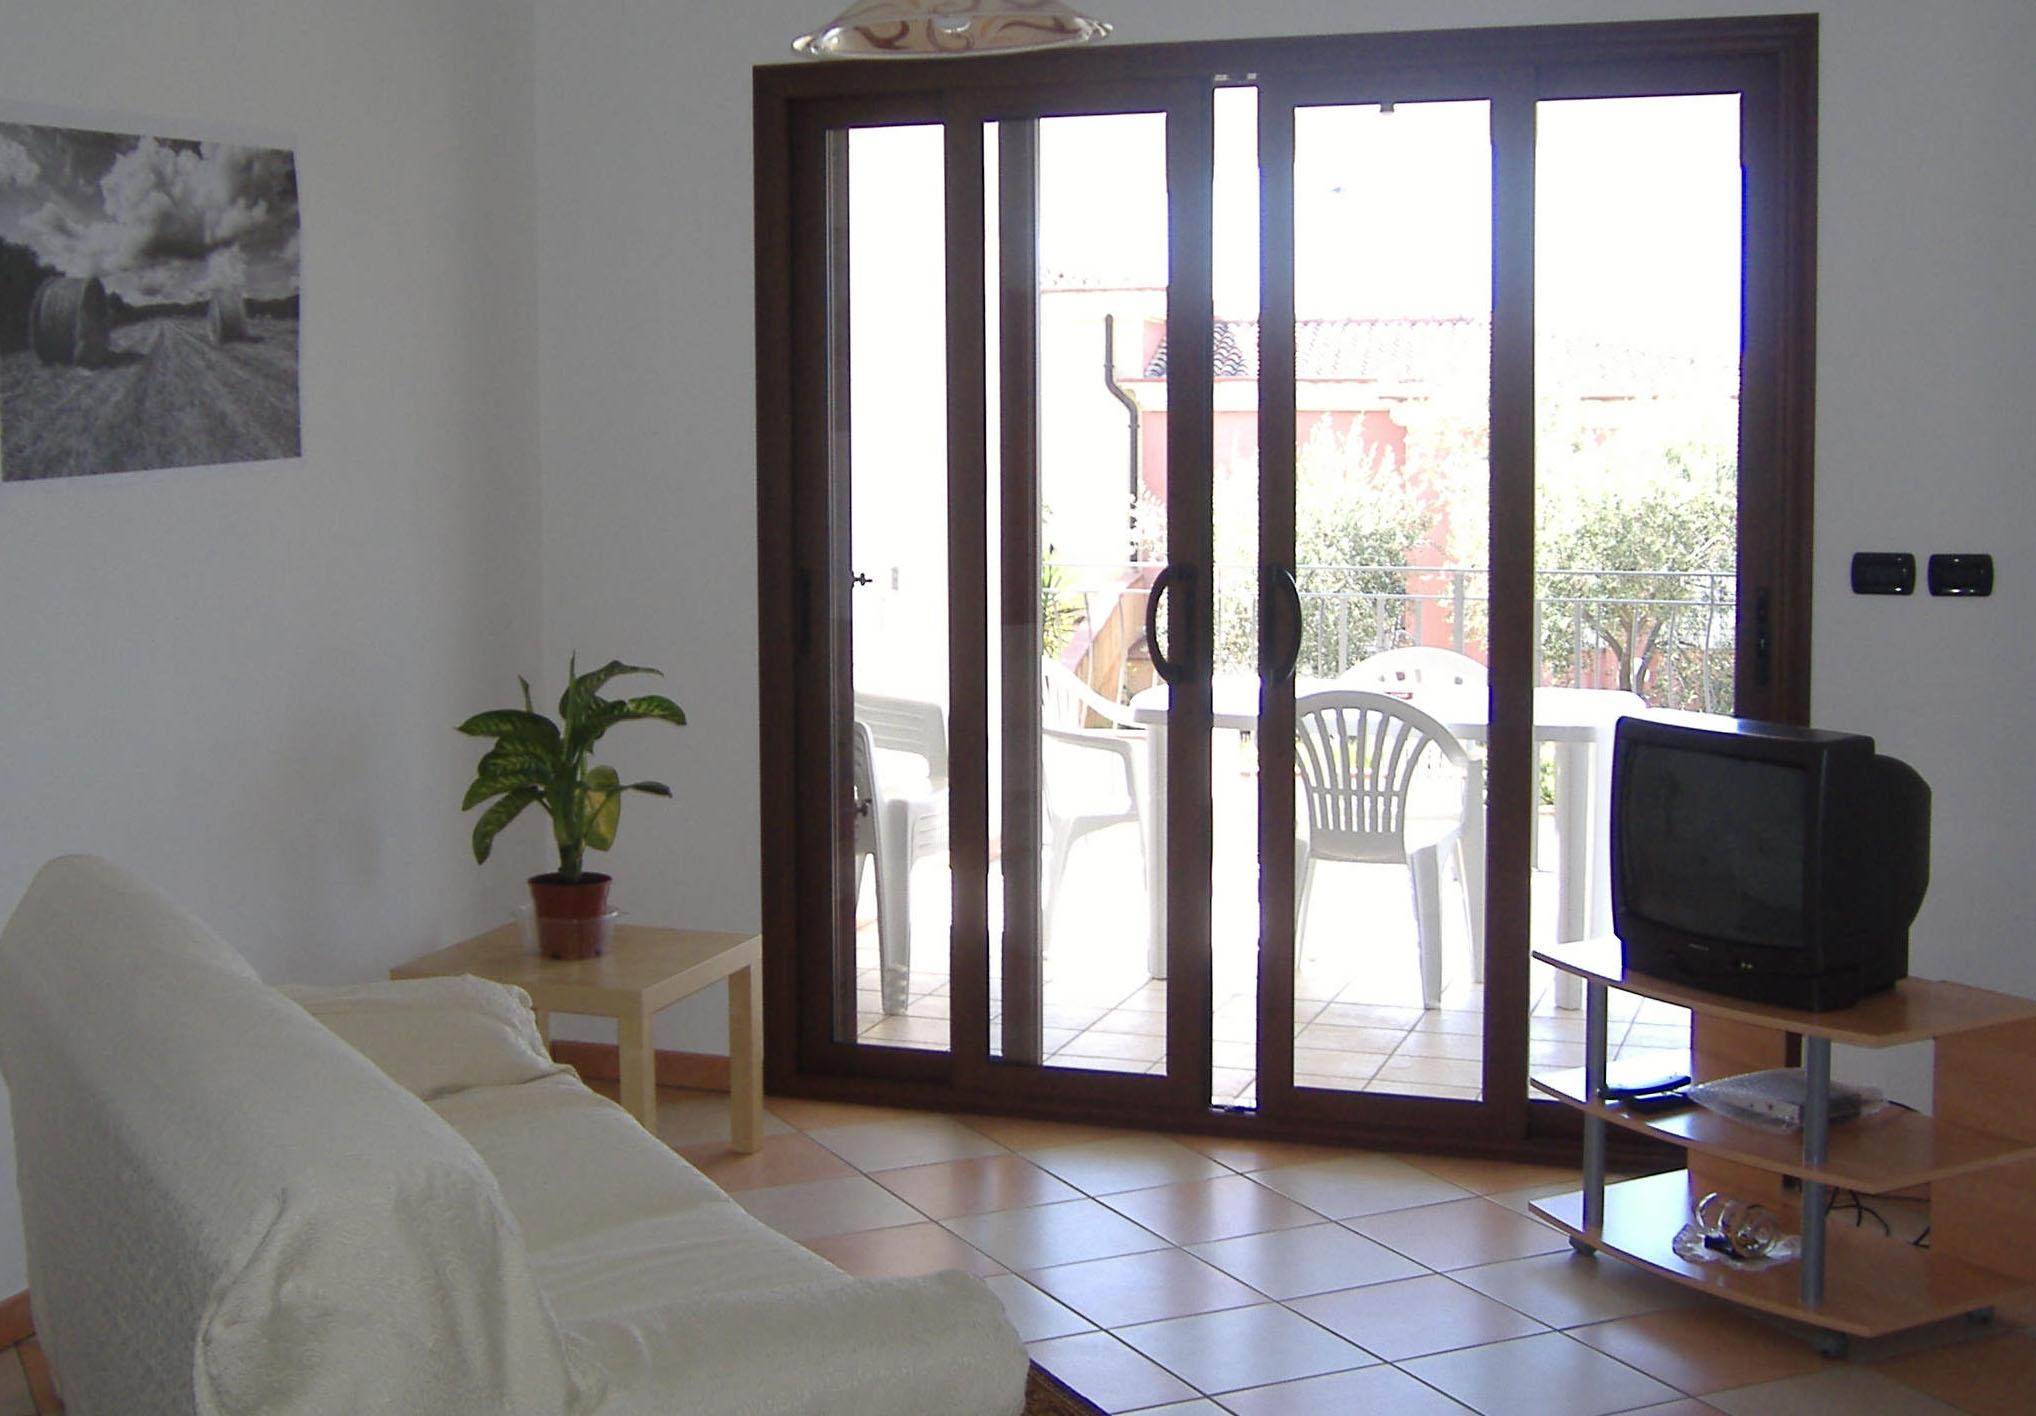 affitto villa mare tortoli 6750 (20110502190548-2011-70422-NDP.jpg)